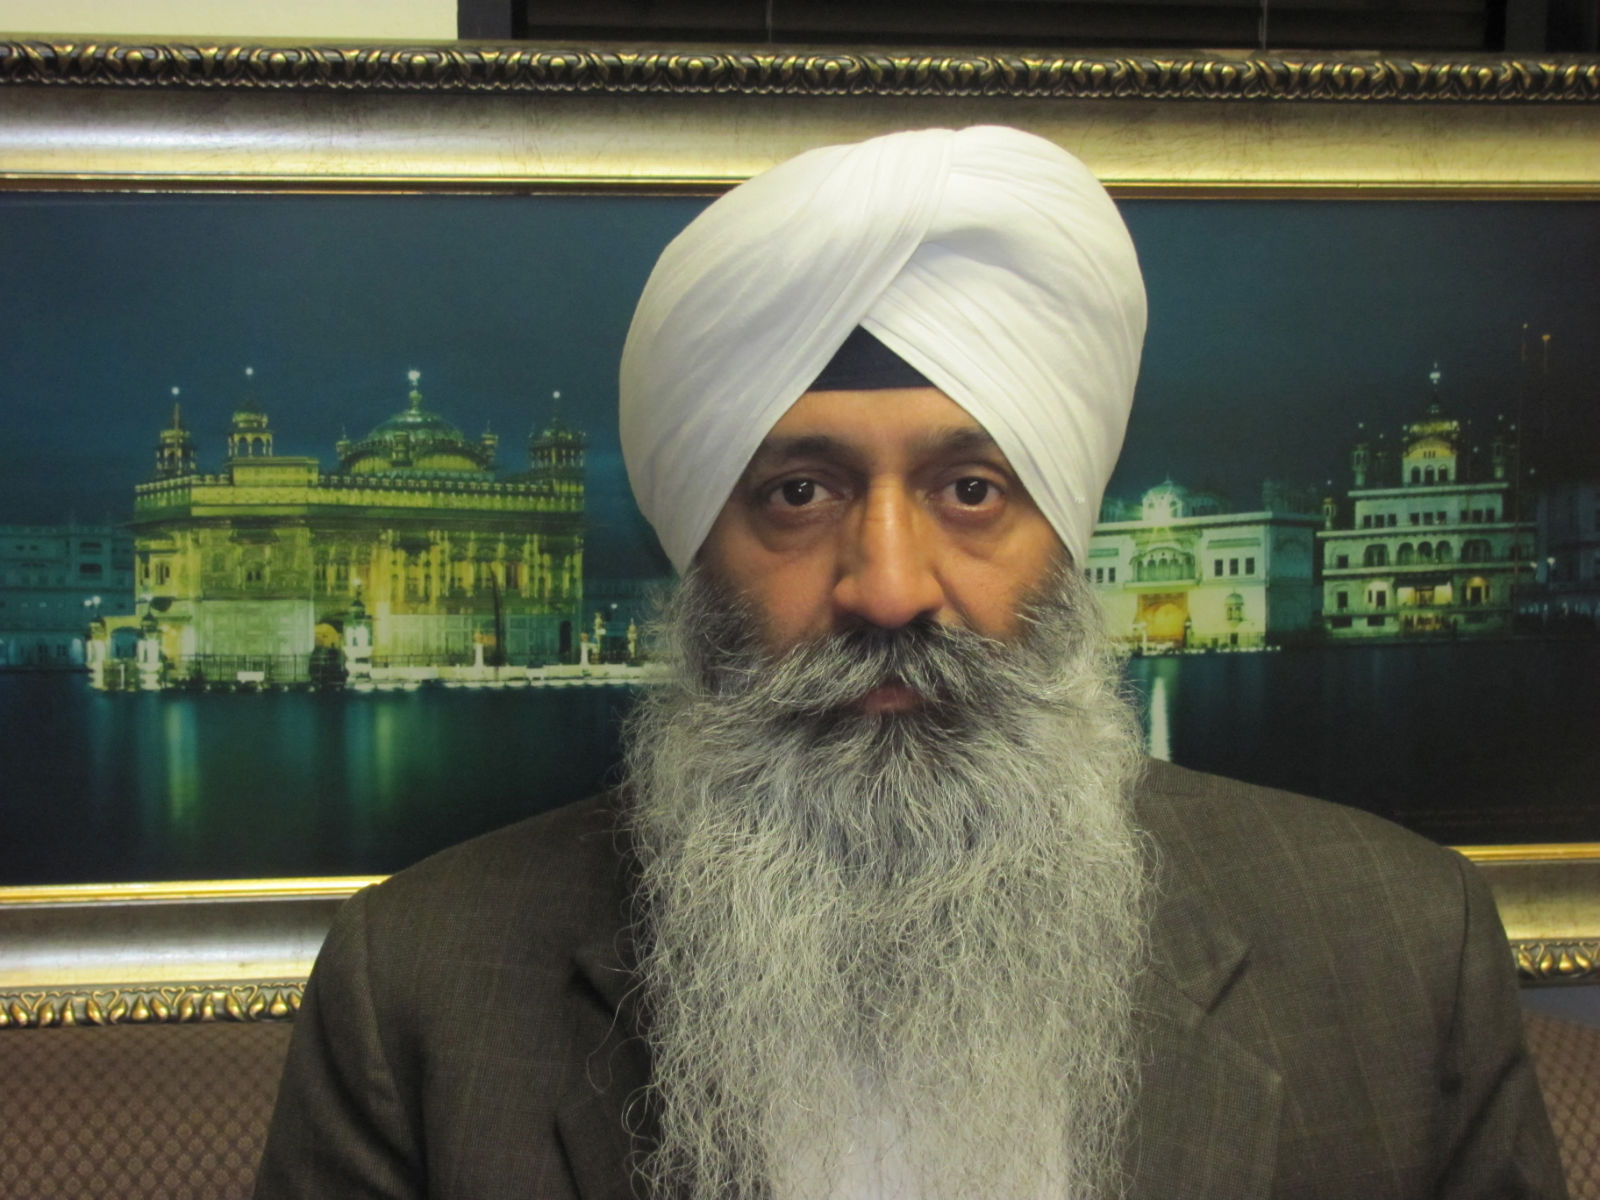 Manjeet Singh Saini, a witness against Amitabh Bachchan